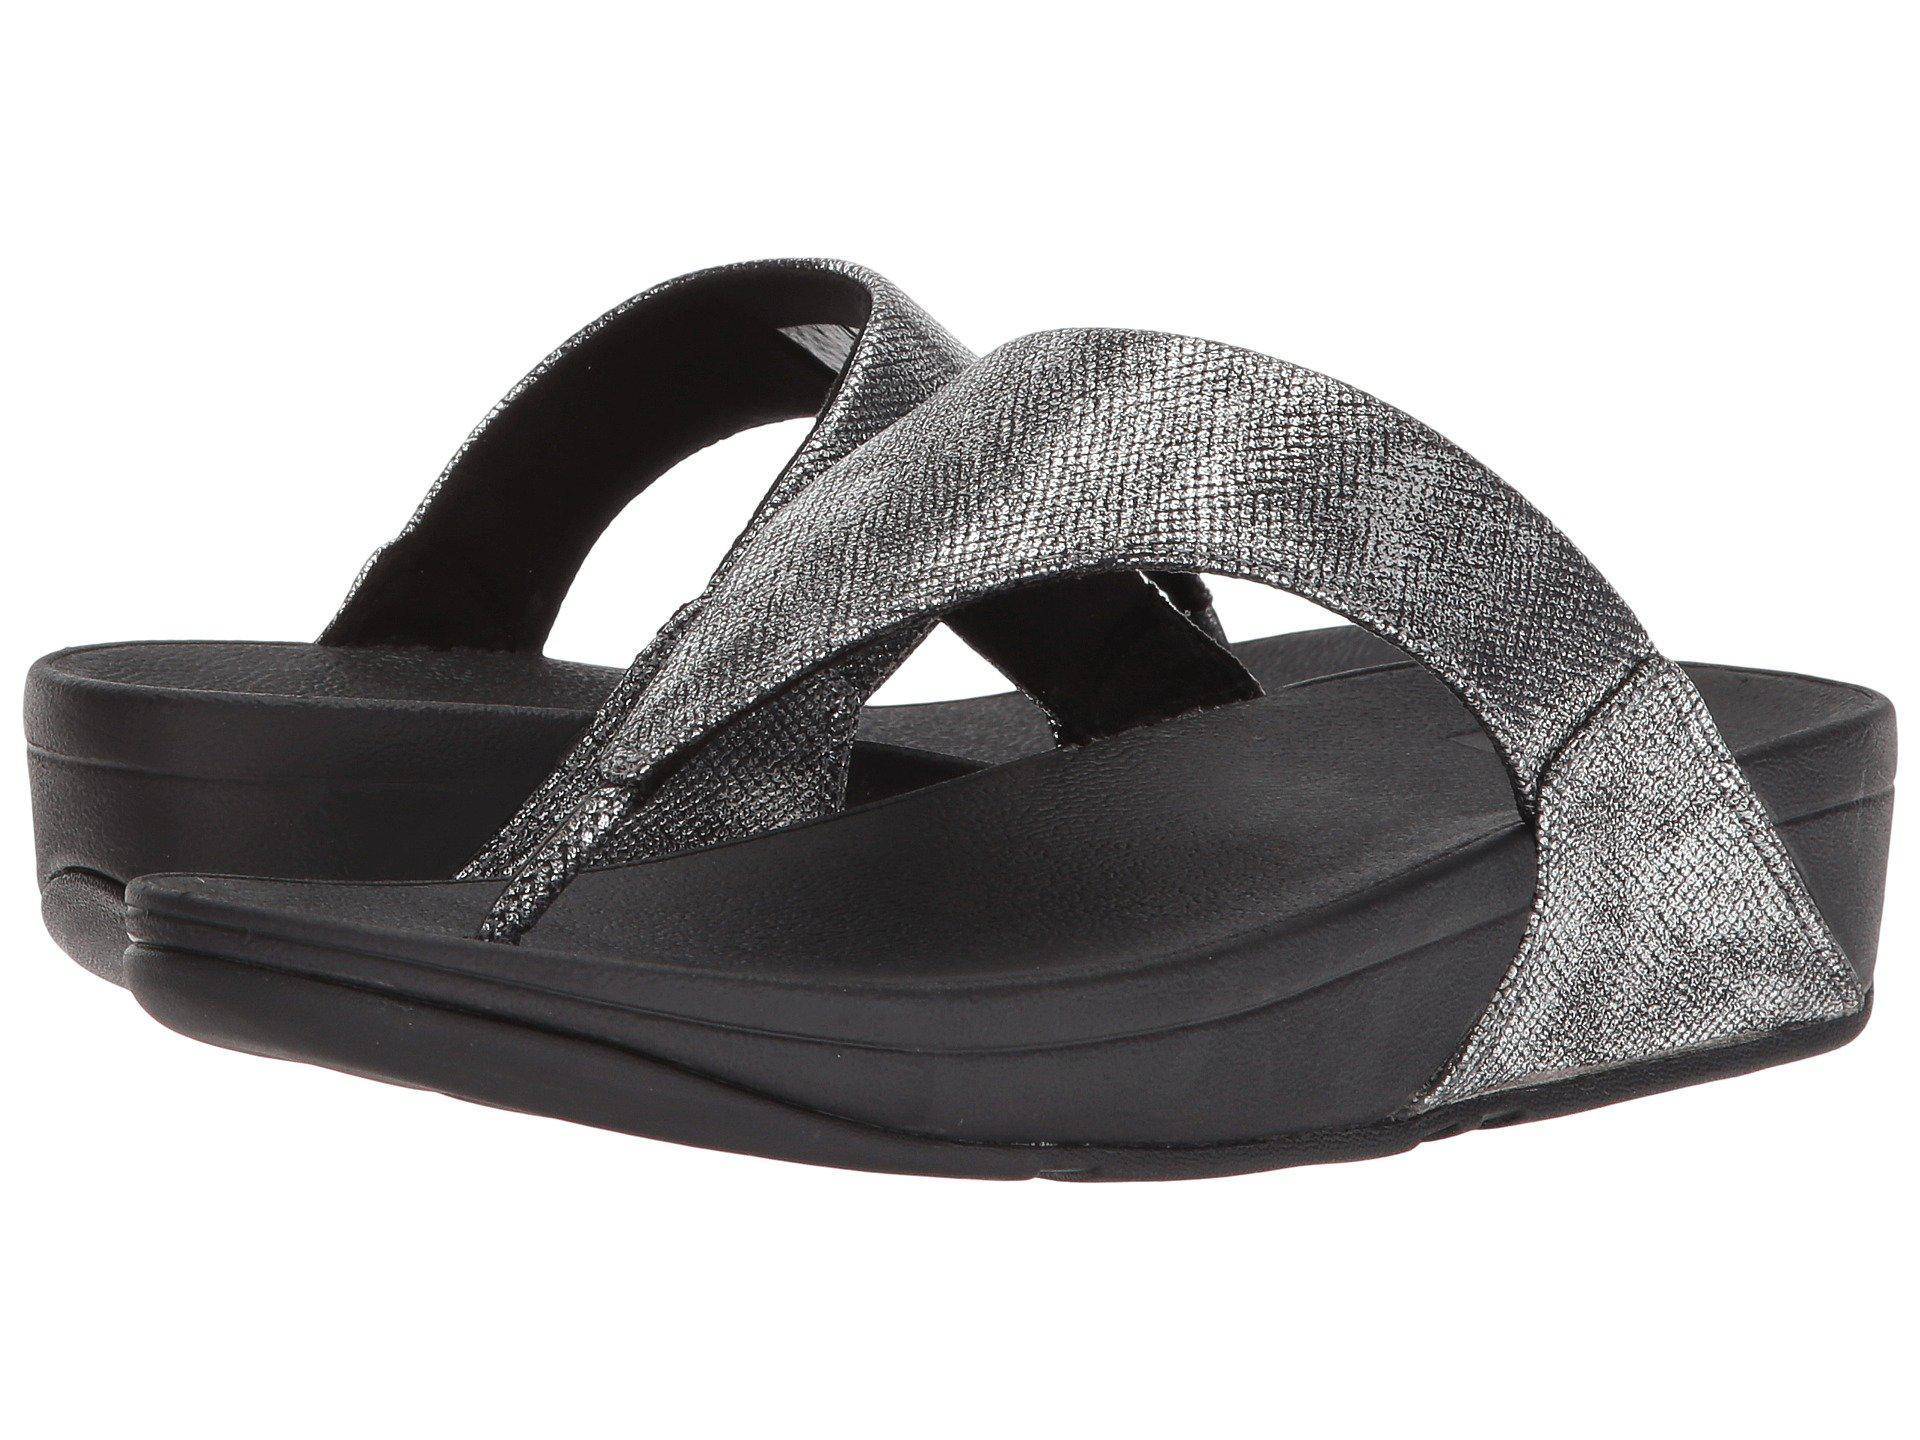 42239b8ba60f9a Lyst - Fitflop Lulu Toe-thong Sandal in Black - Save 36%